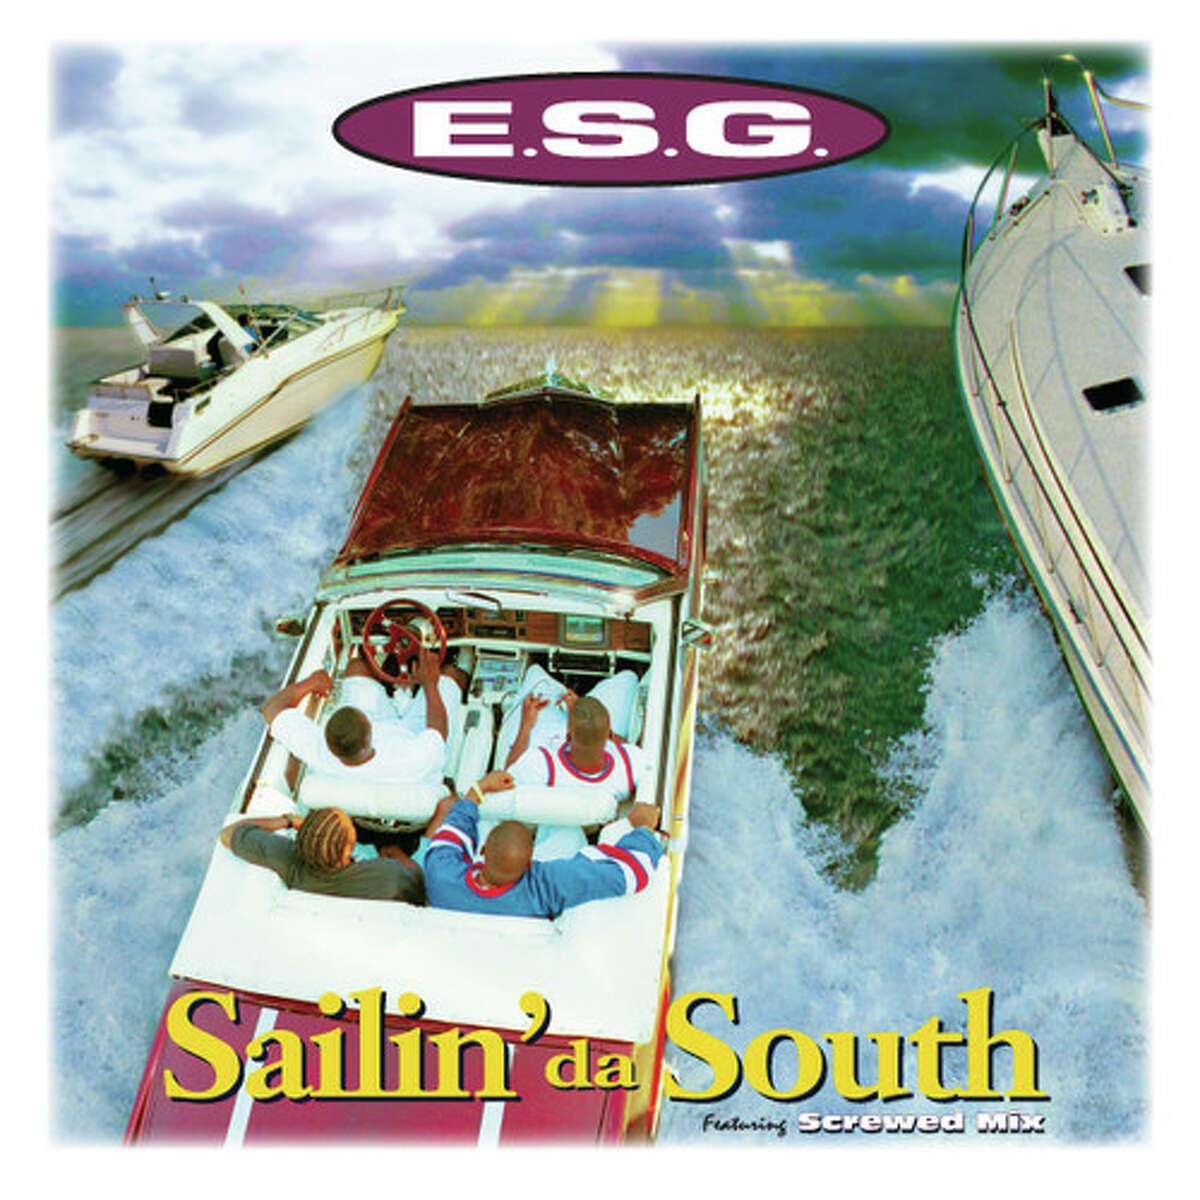 E.S.G.- Sailin' Da South (1995). Houston, Texas.